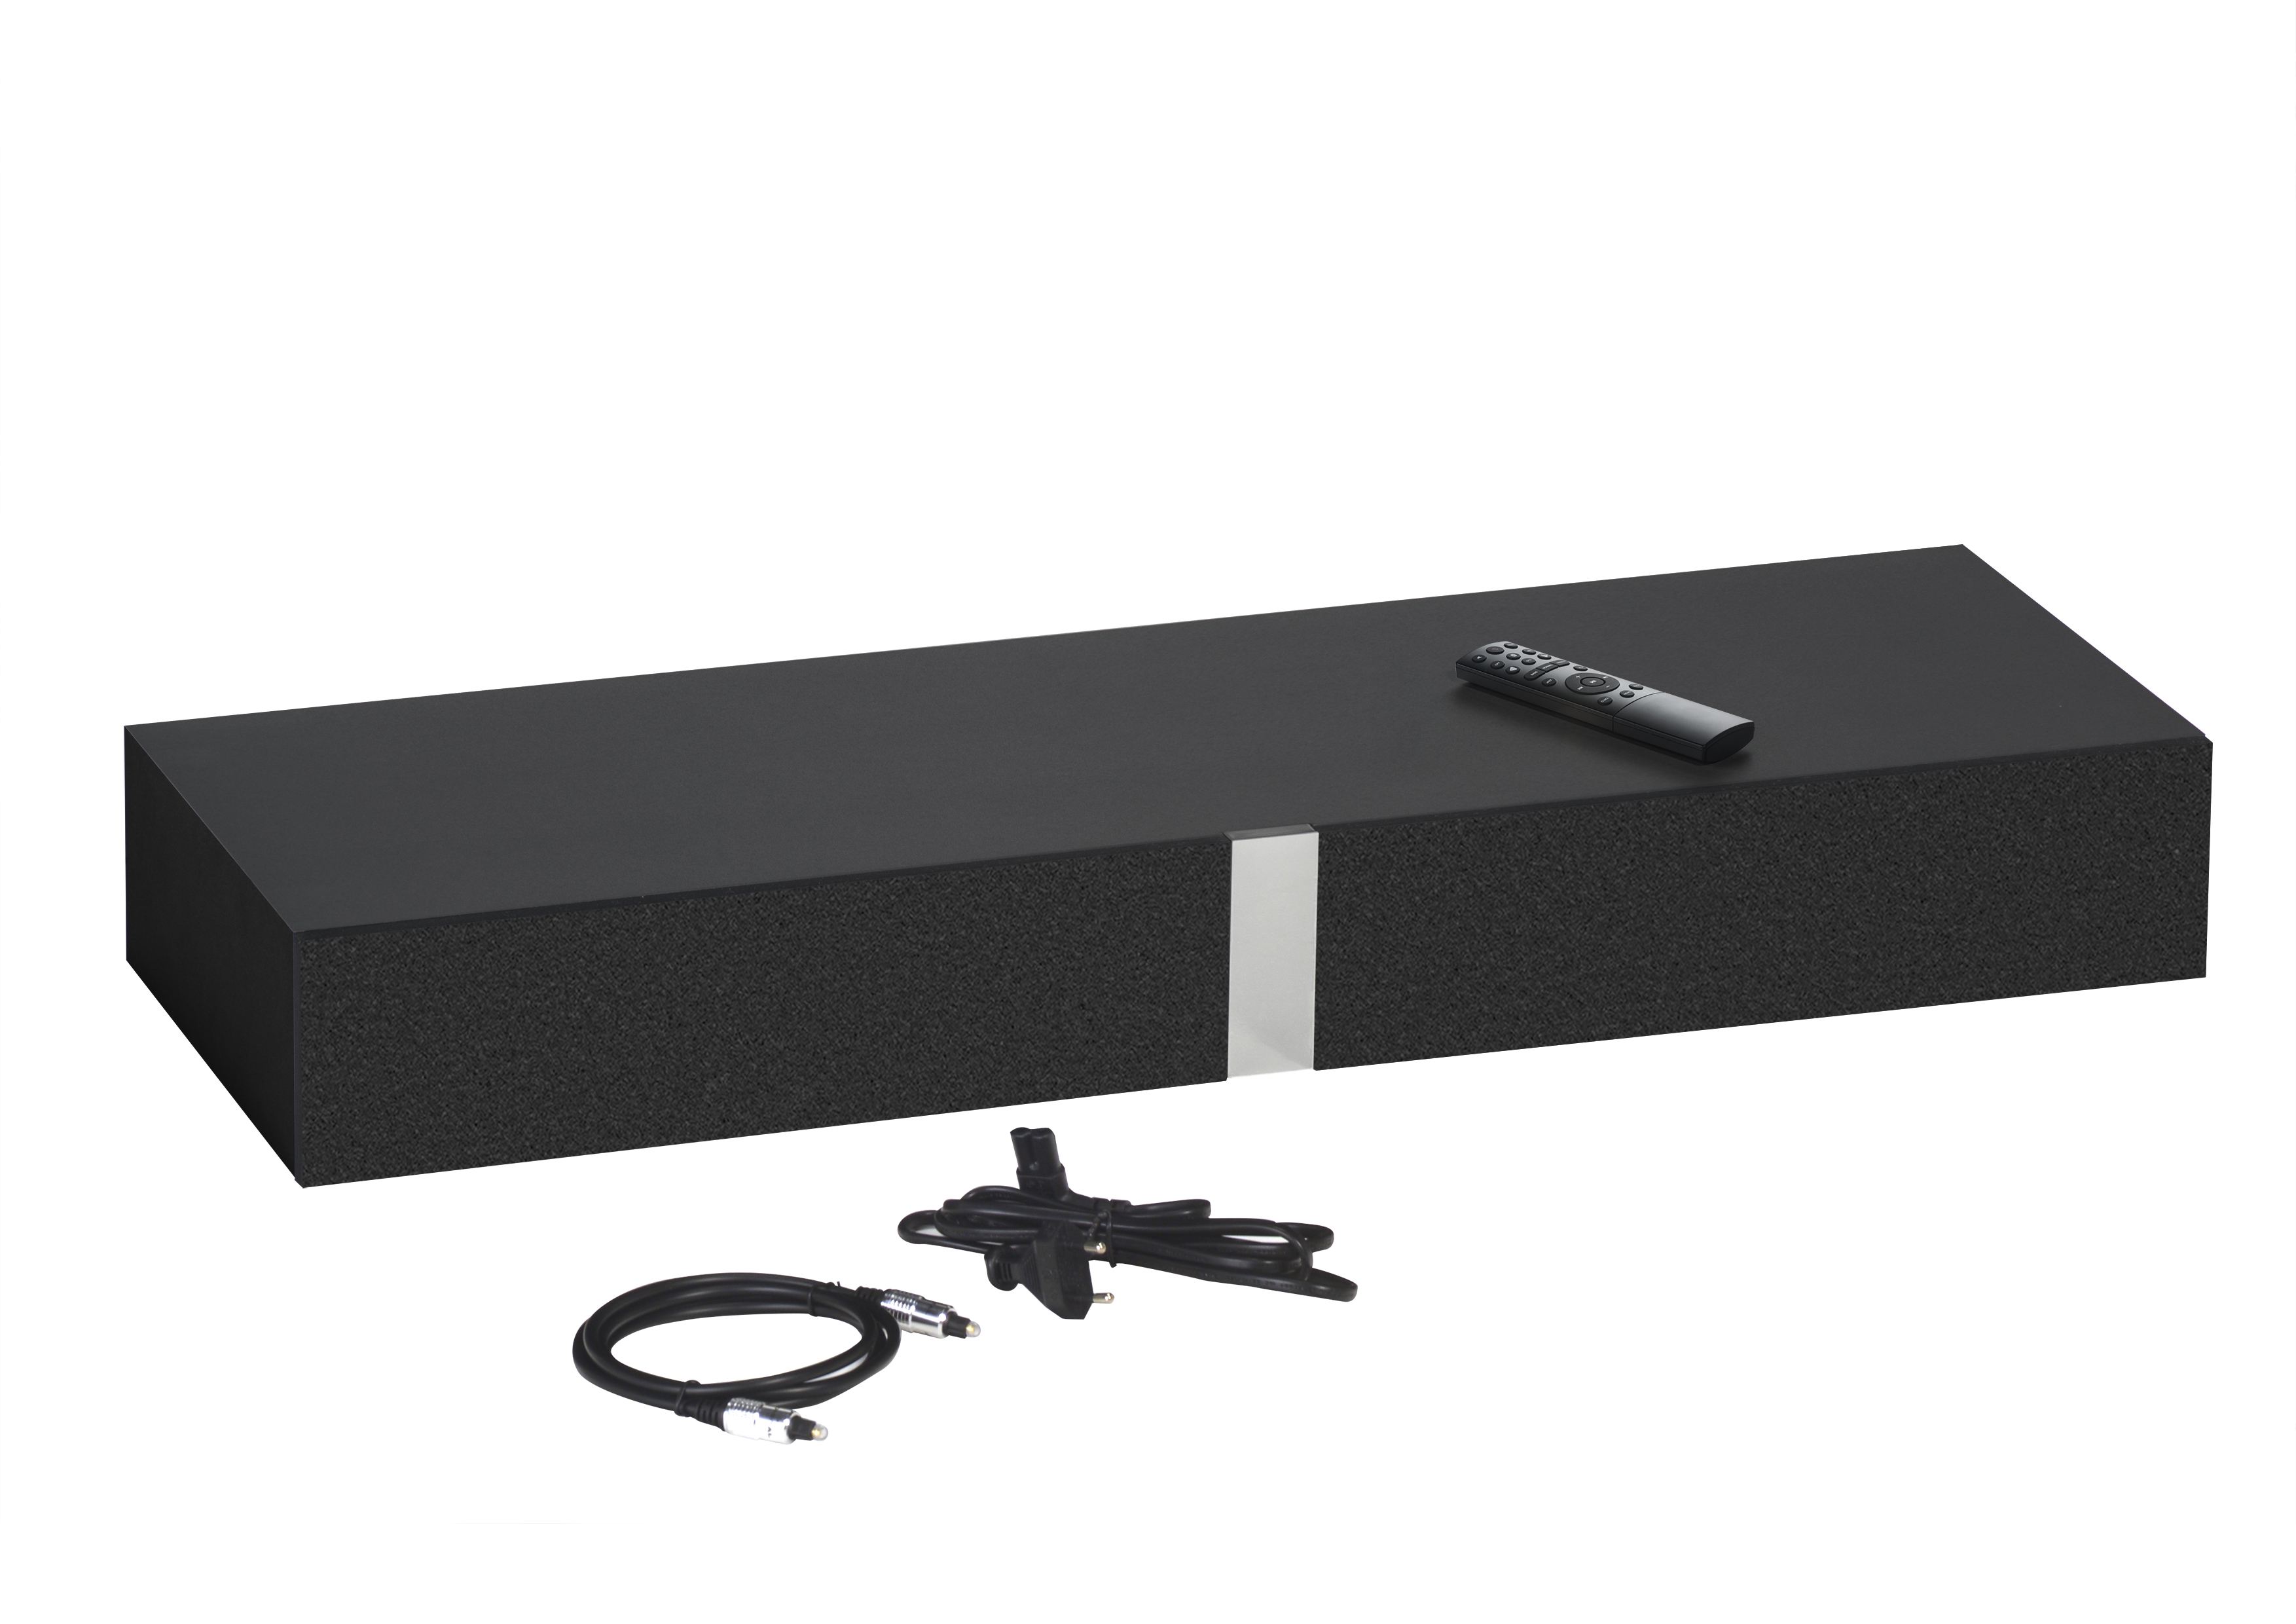 lowboard 160 cm breit soundconcept wood von maja riviera. Black Bedroom Furniture Sets. Home Design Ideas